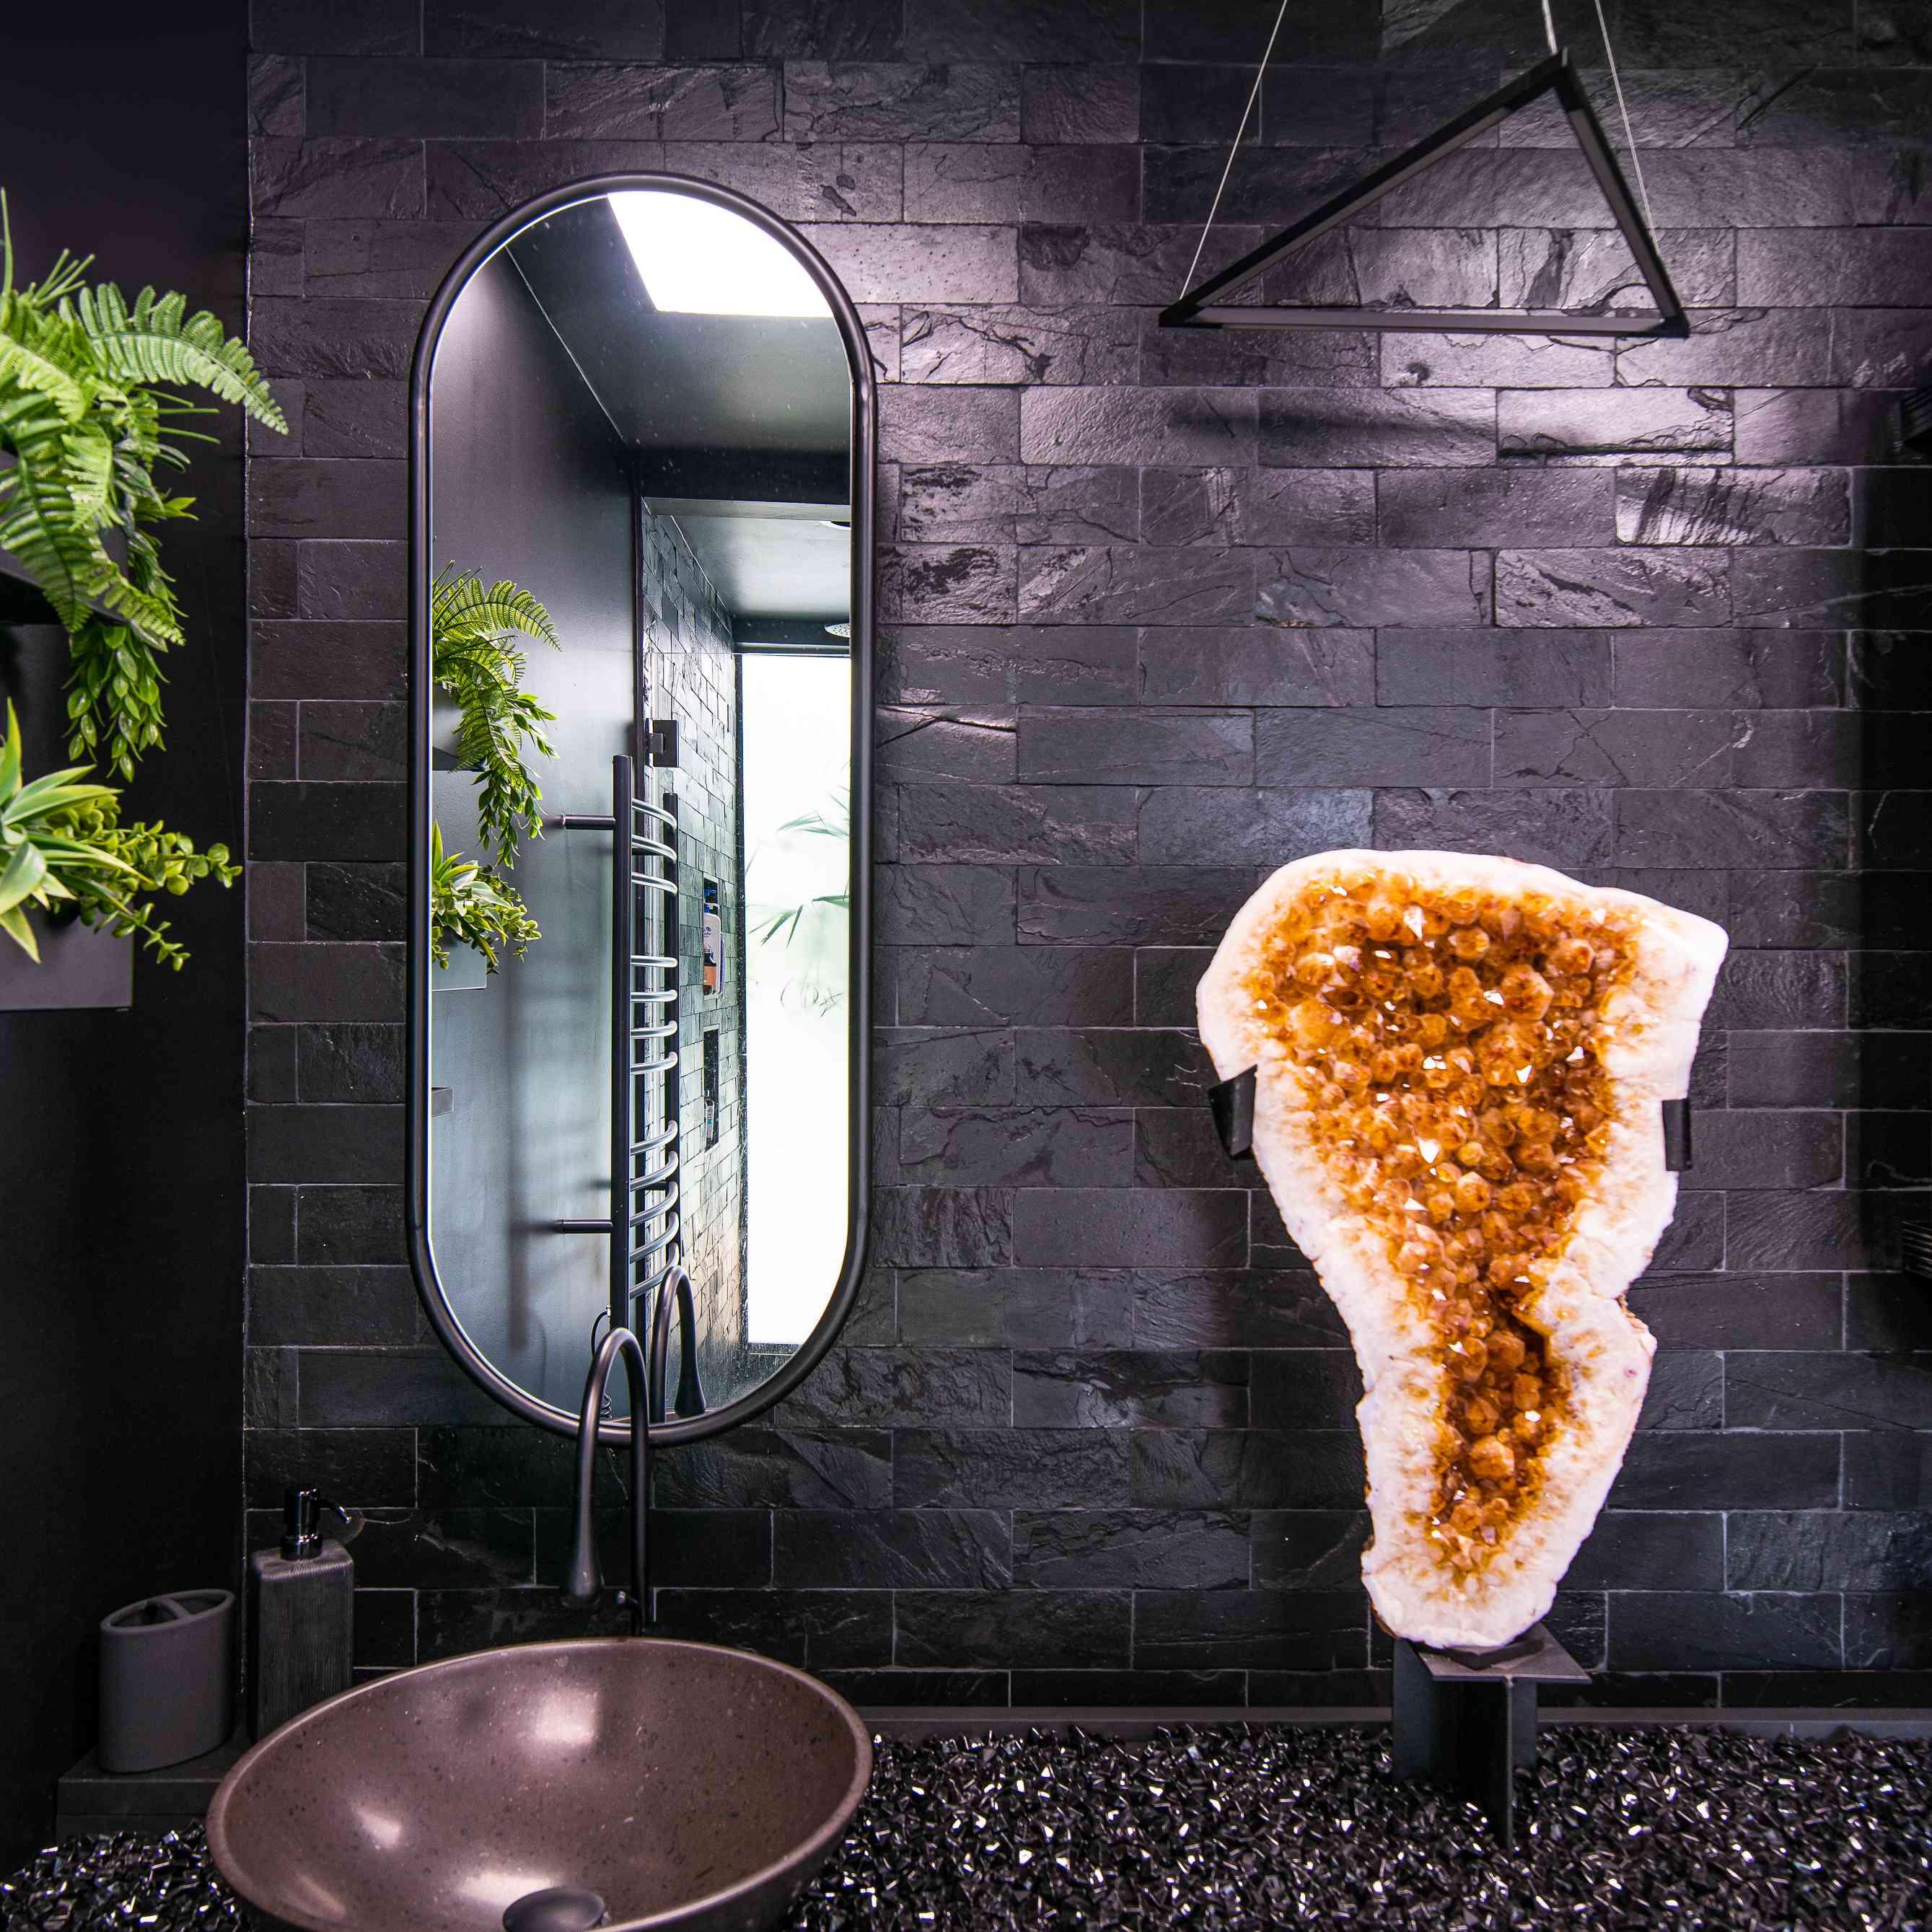 Black bathroom with a healing crystal